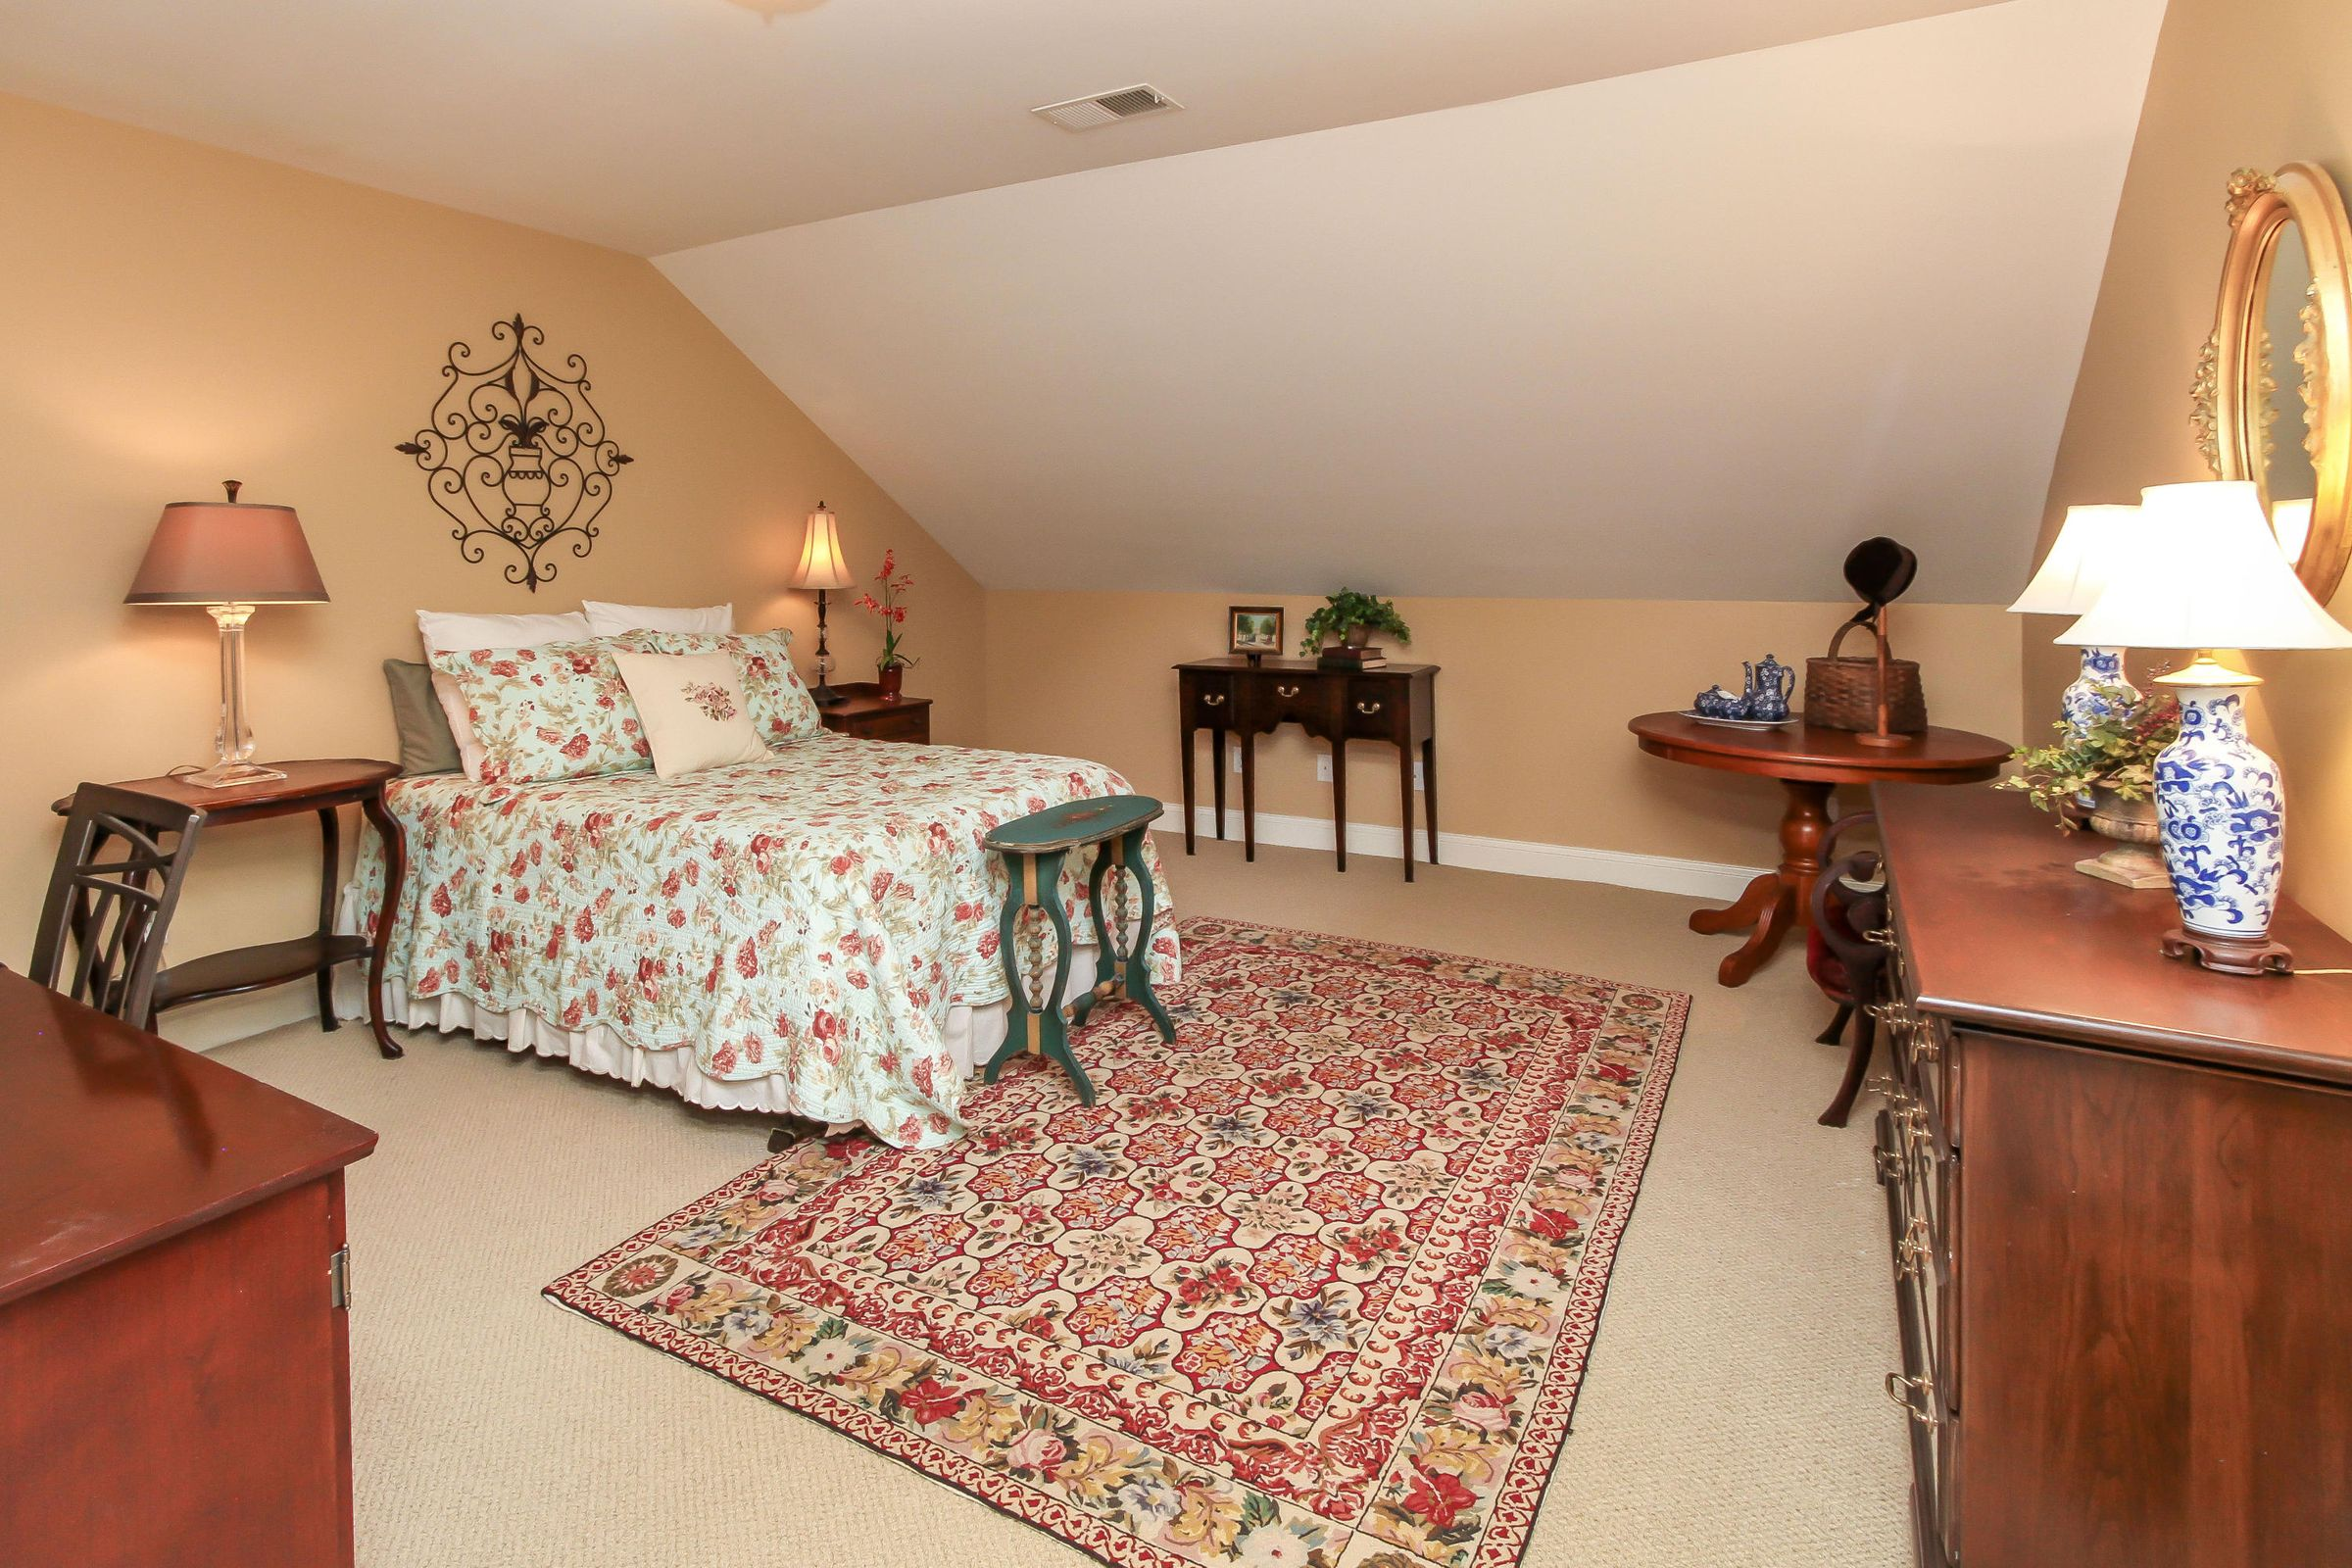 29 - Bedroom 4 upstairs